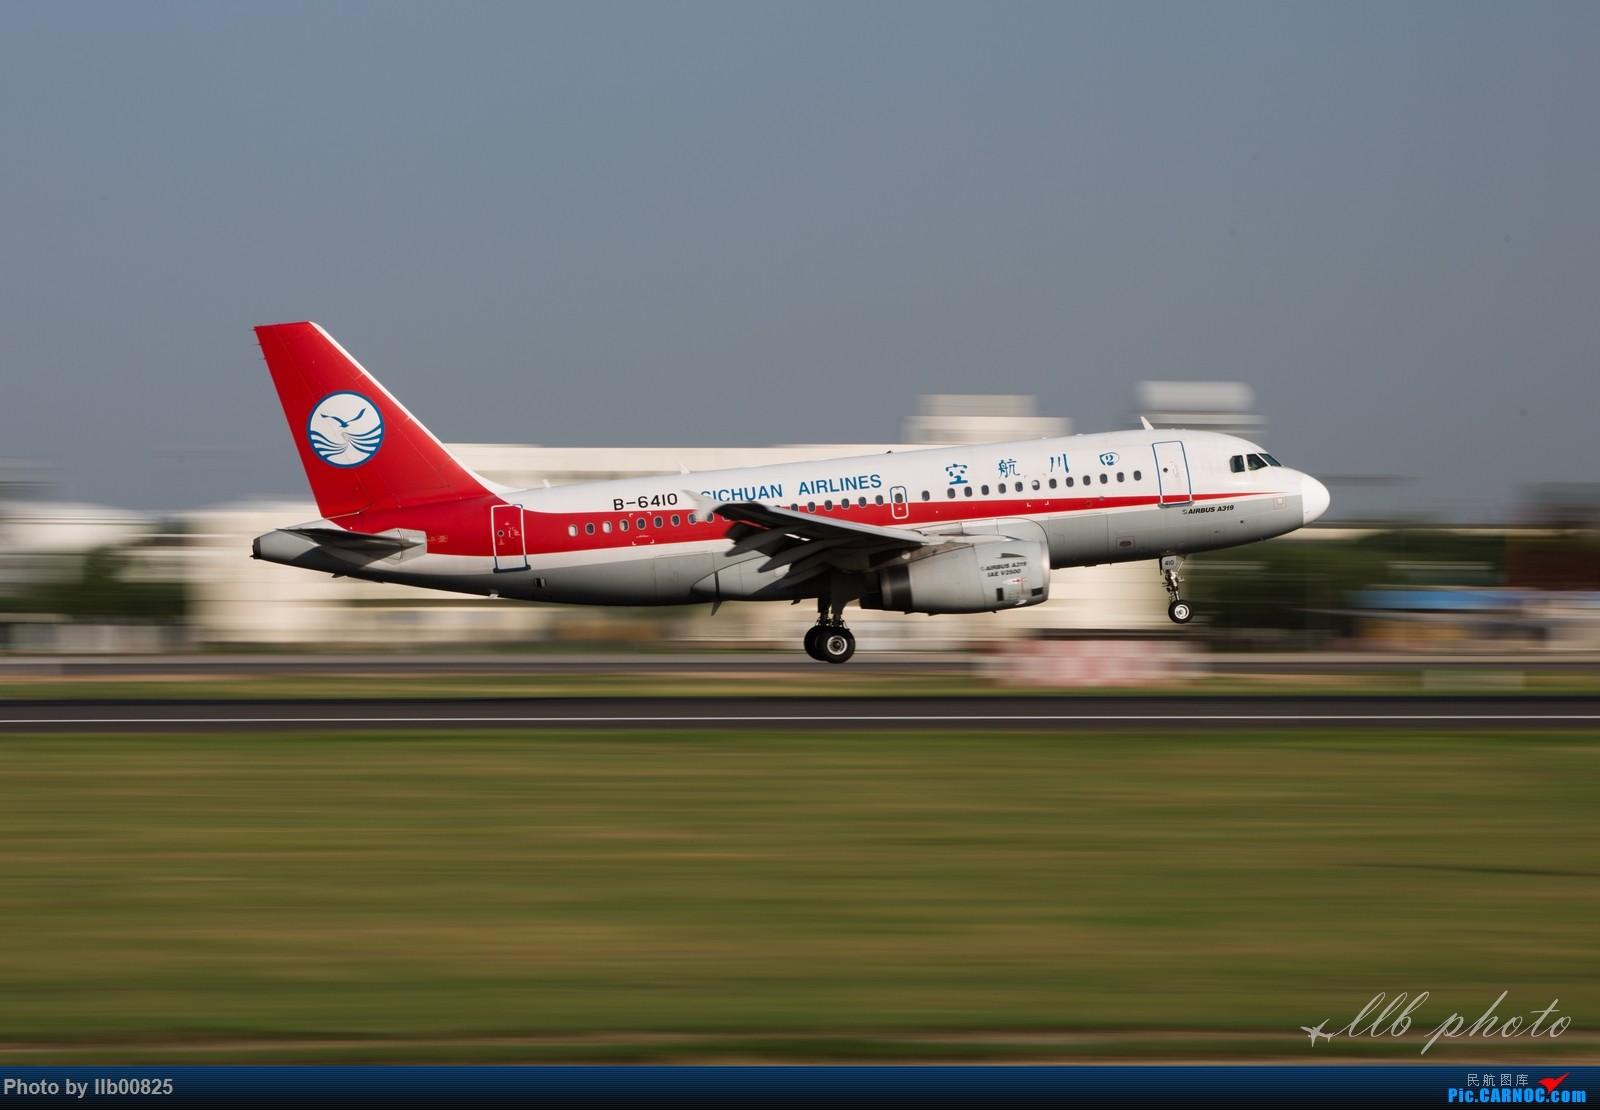 Re:[原创]XIY雨过天晴 AIRBUS A319-100 B-6410 中国西安咸阳国际机场